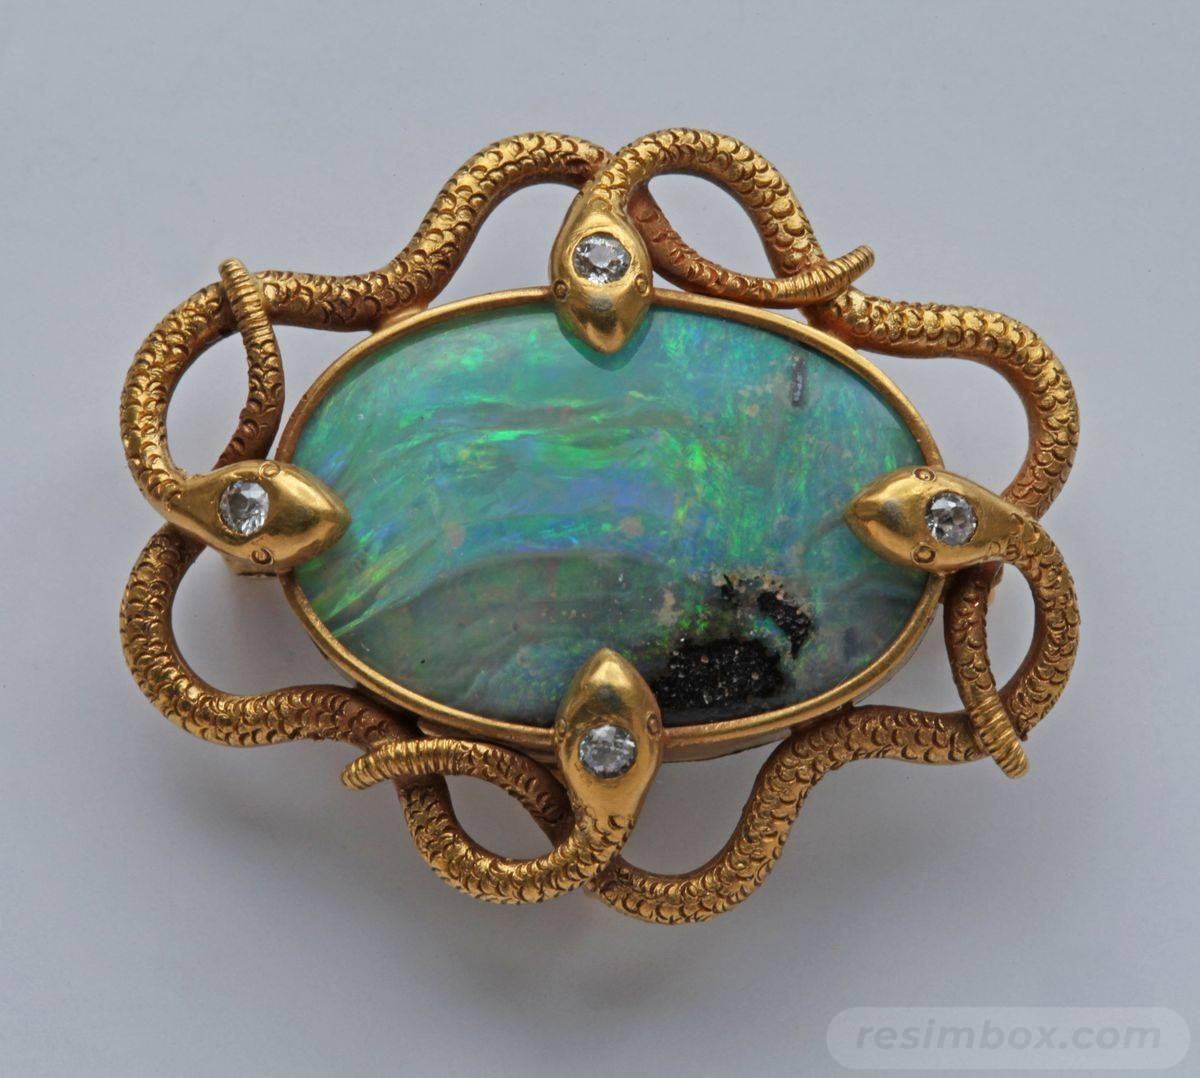 Art deco jewelry-398216792046525029